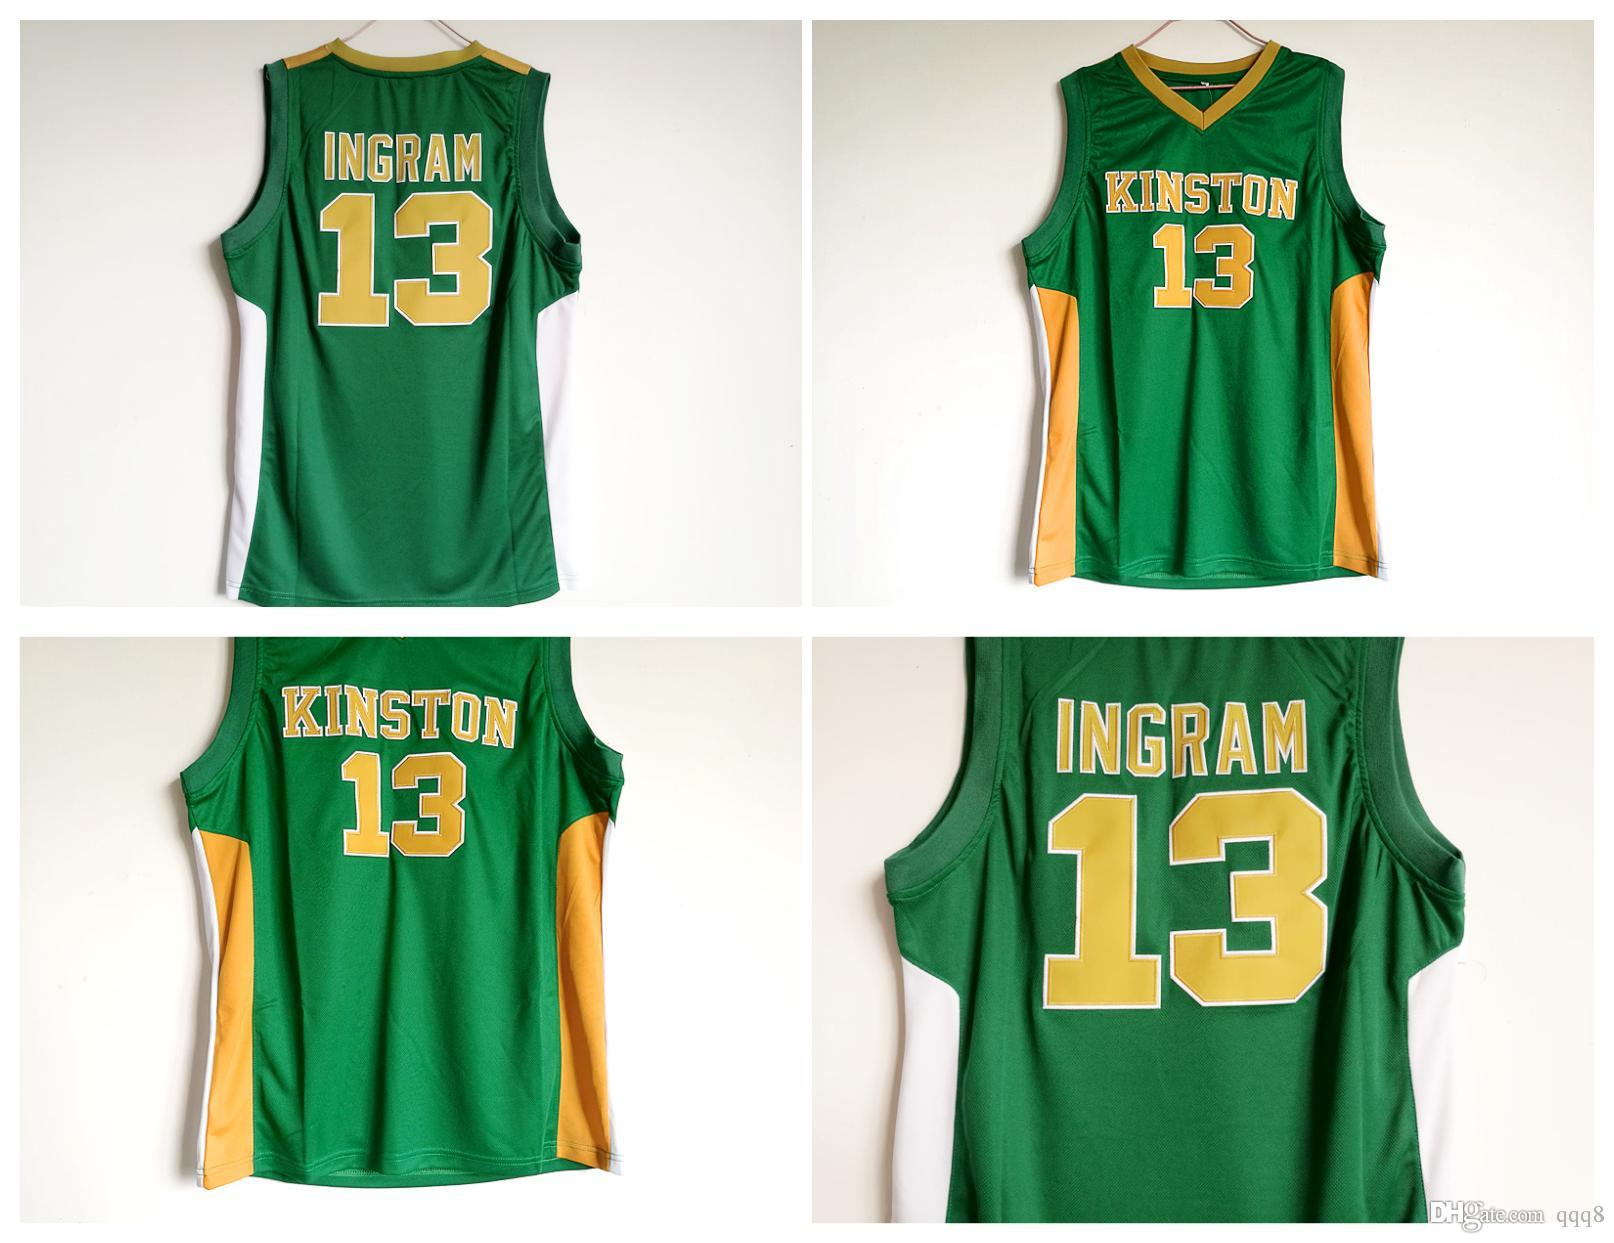 wholesale dealer ee7fa 702d5 13 Brandon Ingram Jersey Kinston high school Jersey College Basketball  Jerseys Blue Stitched Sports Shirt Top Quality !